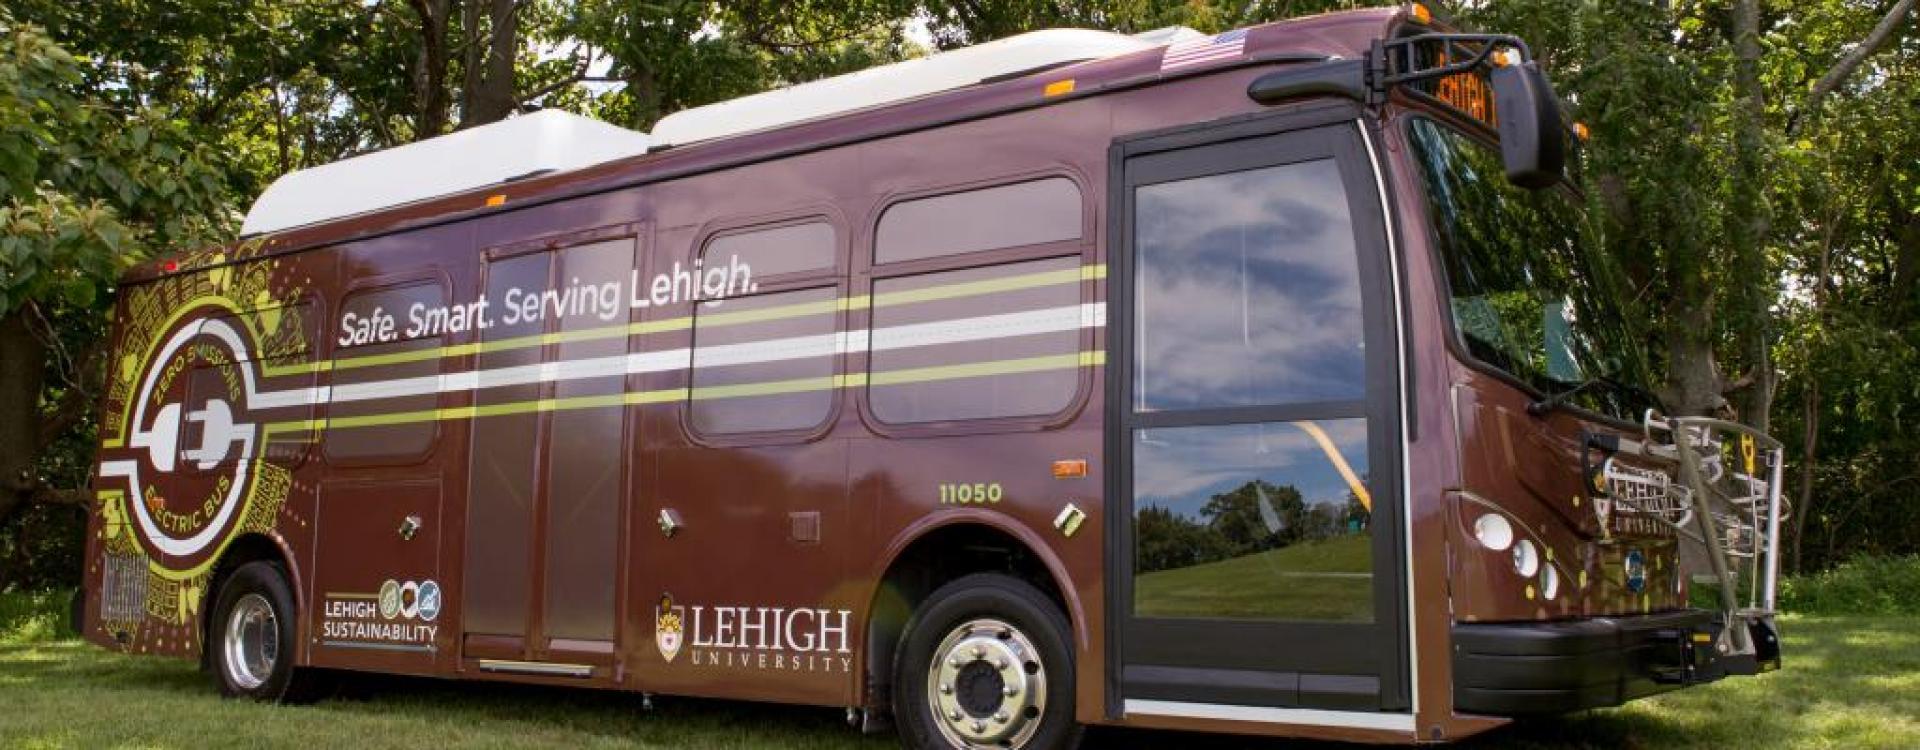 Electric Bus in the Lehigh Fleet